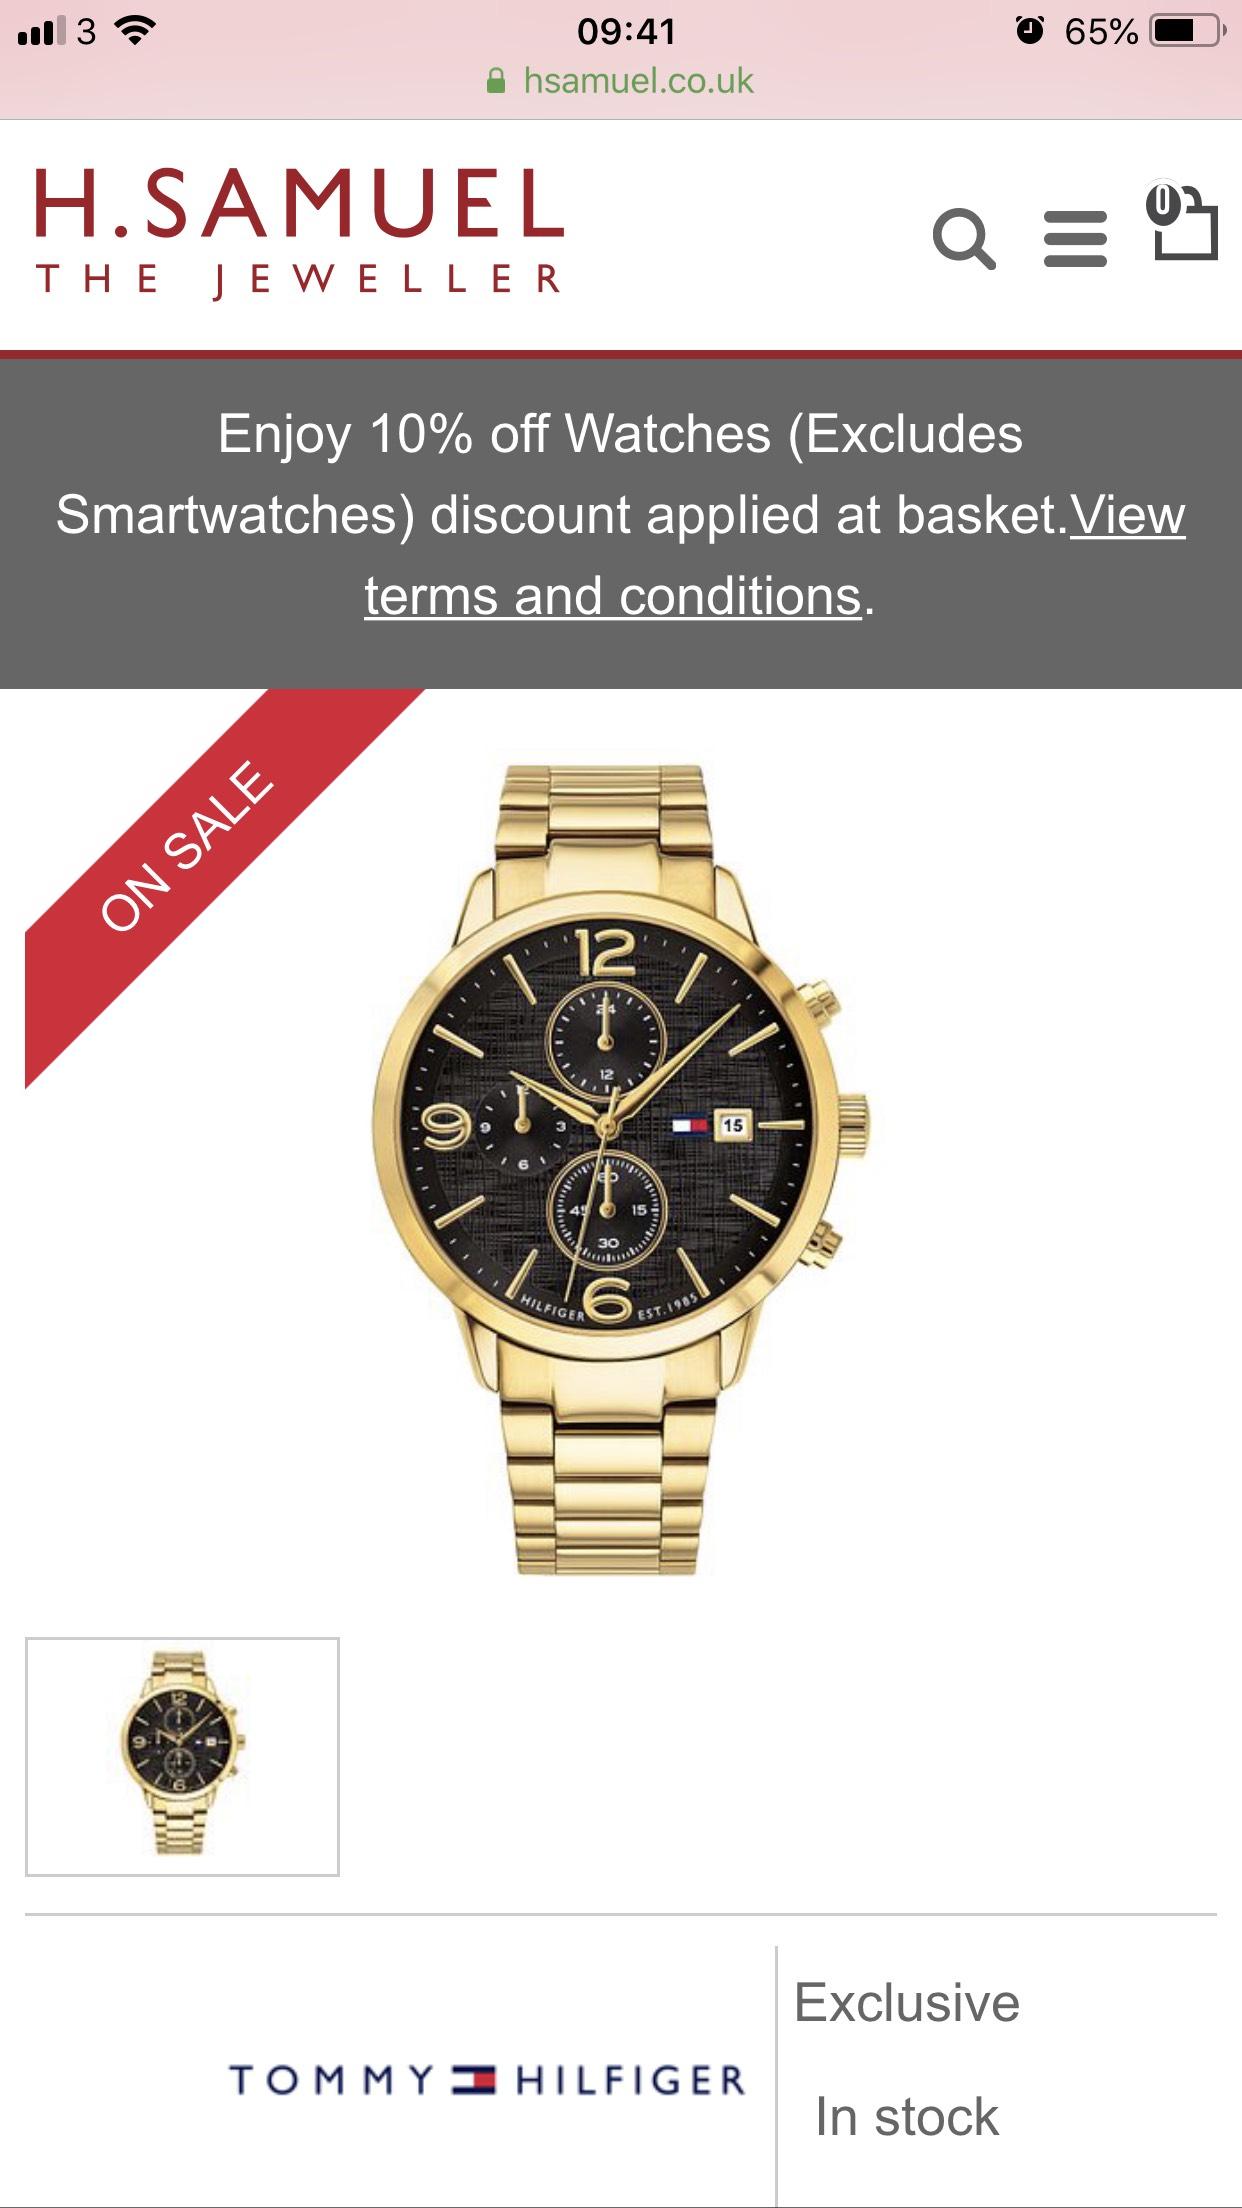 Tommy Hilfiger Men's Gold Tone Black Dial Chronograph watch  delivered £89.99 at H Samuel